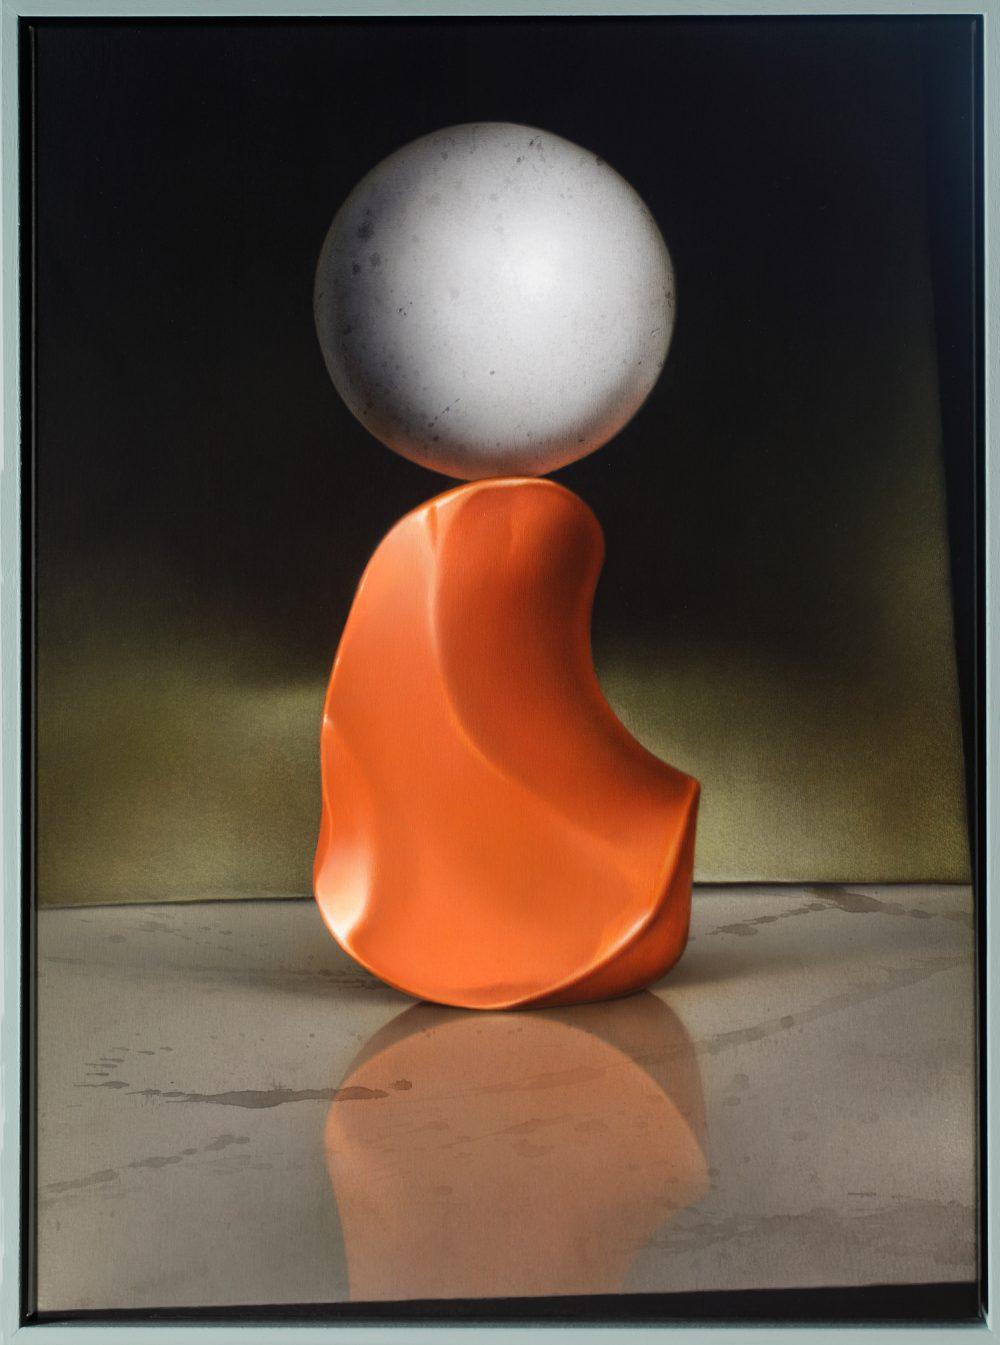 Skulptur in C-Moll (2014), Acryl auf Leinwand, 70 x 50 cm